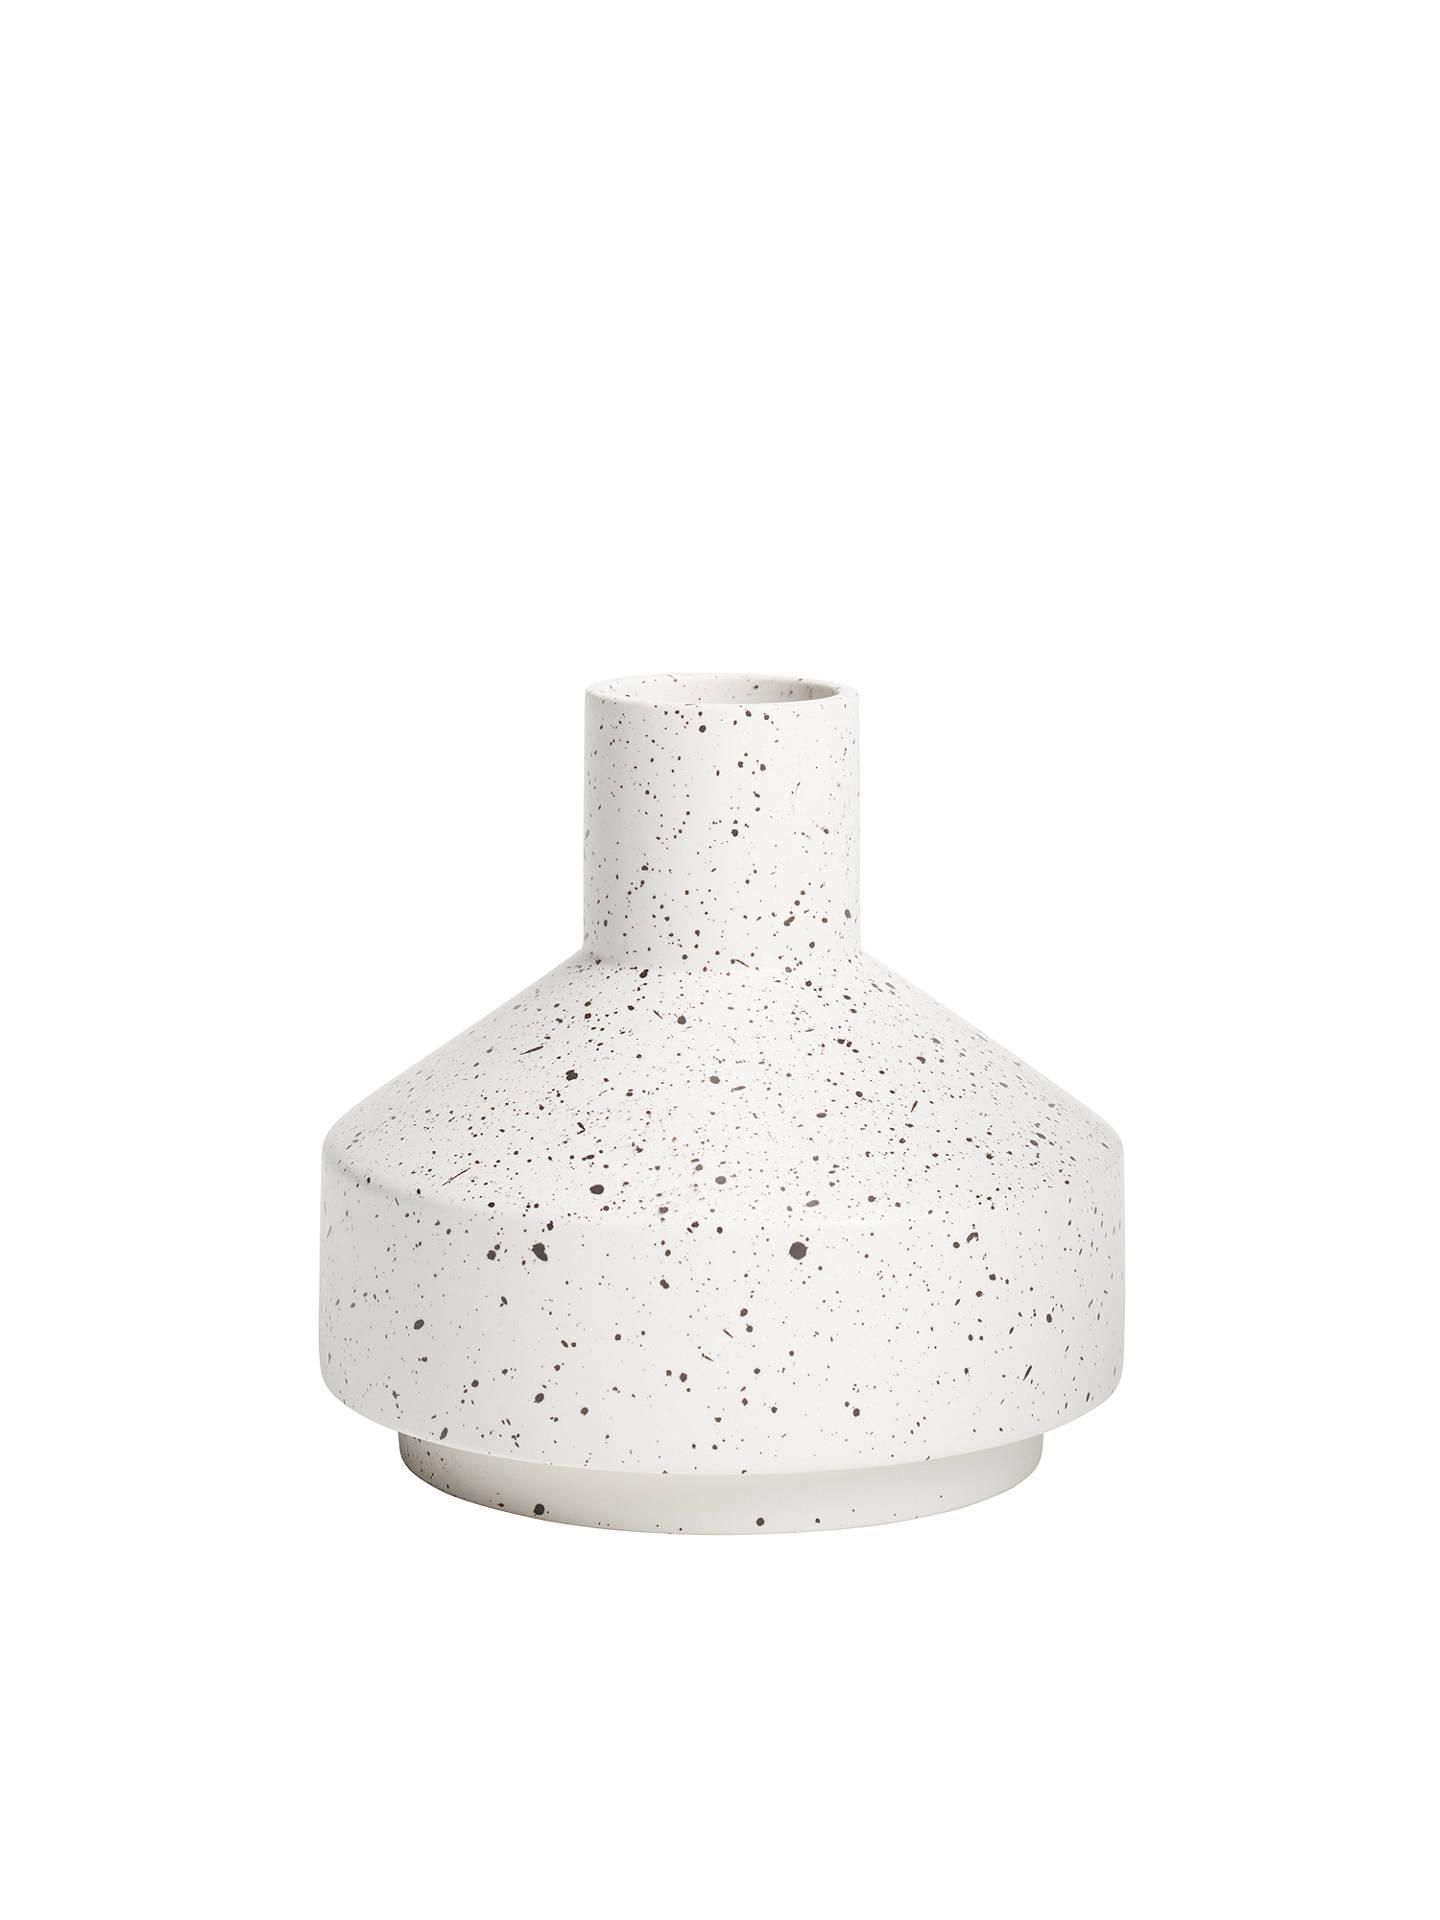 John Lewis & Partners Small Contemporary Vase, 17.5cm, White by John Lewis & Partners